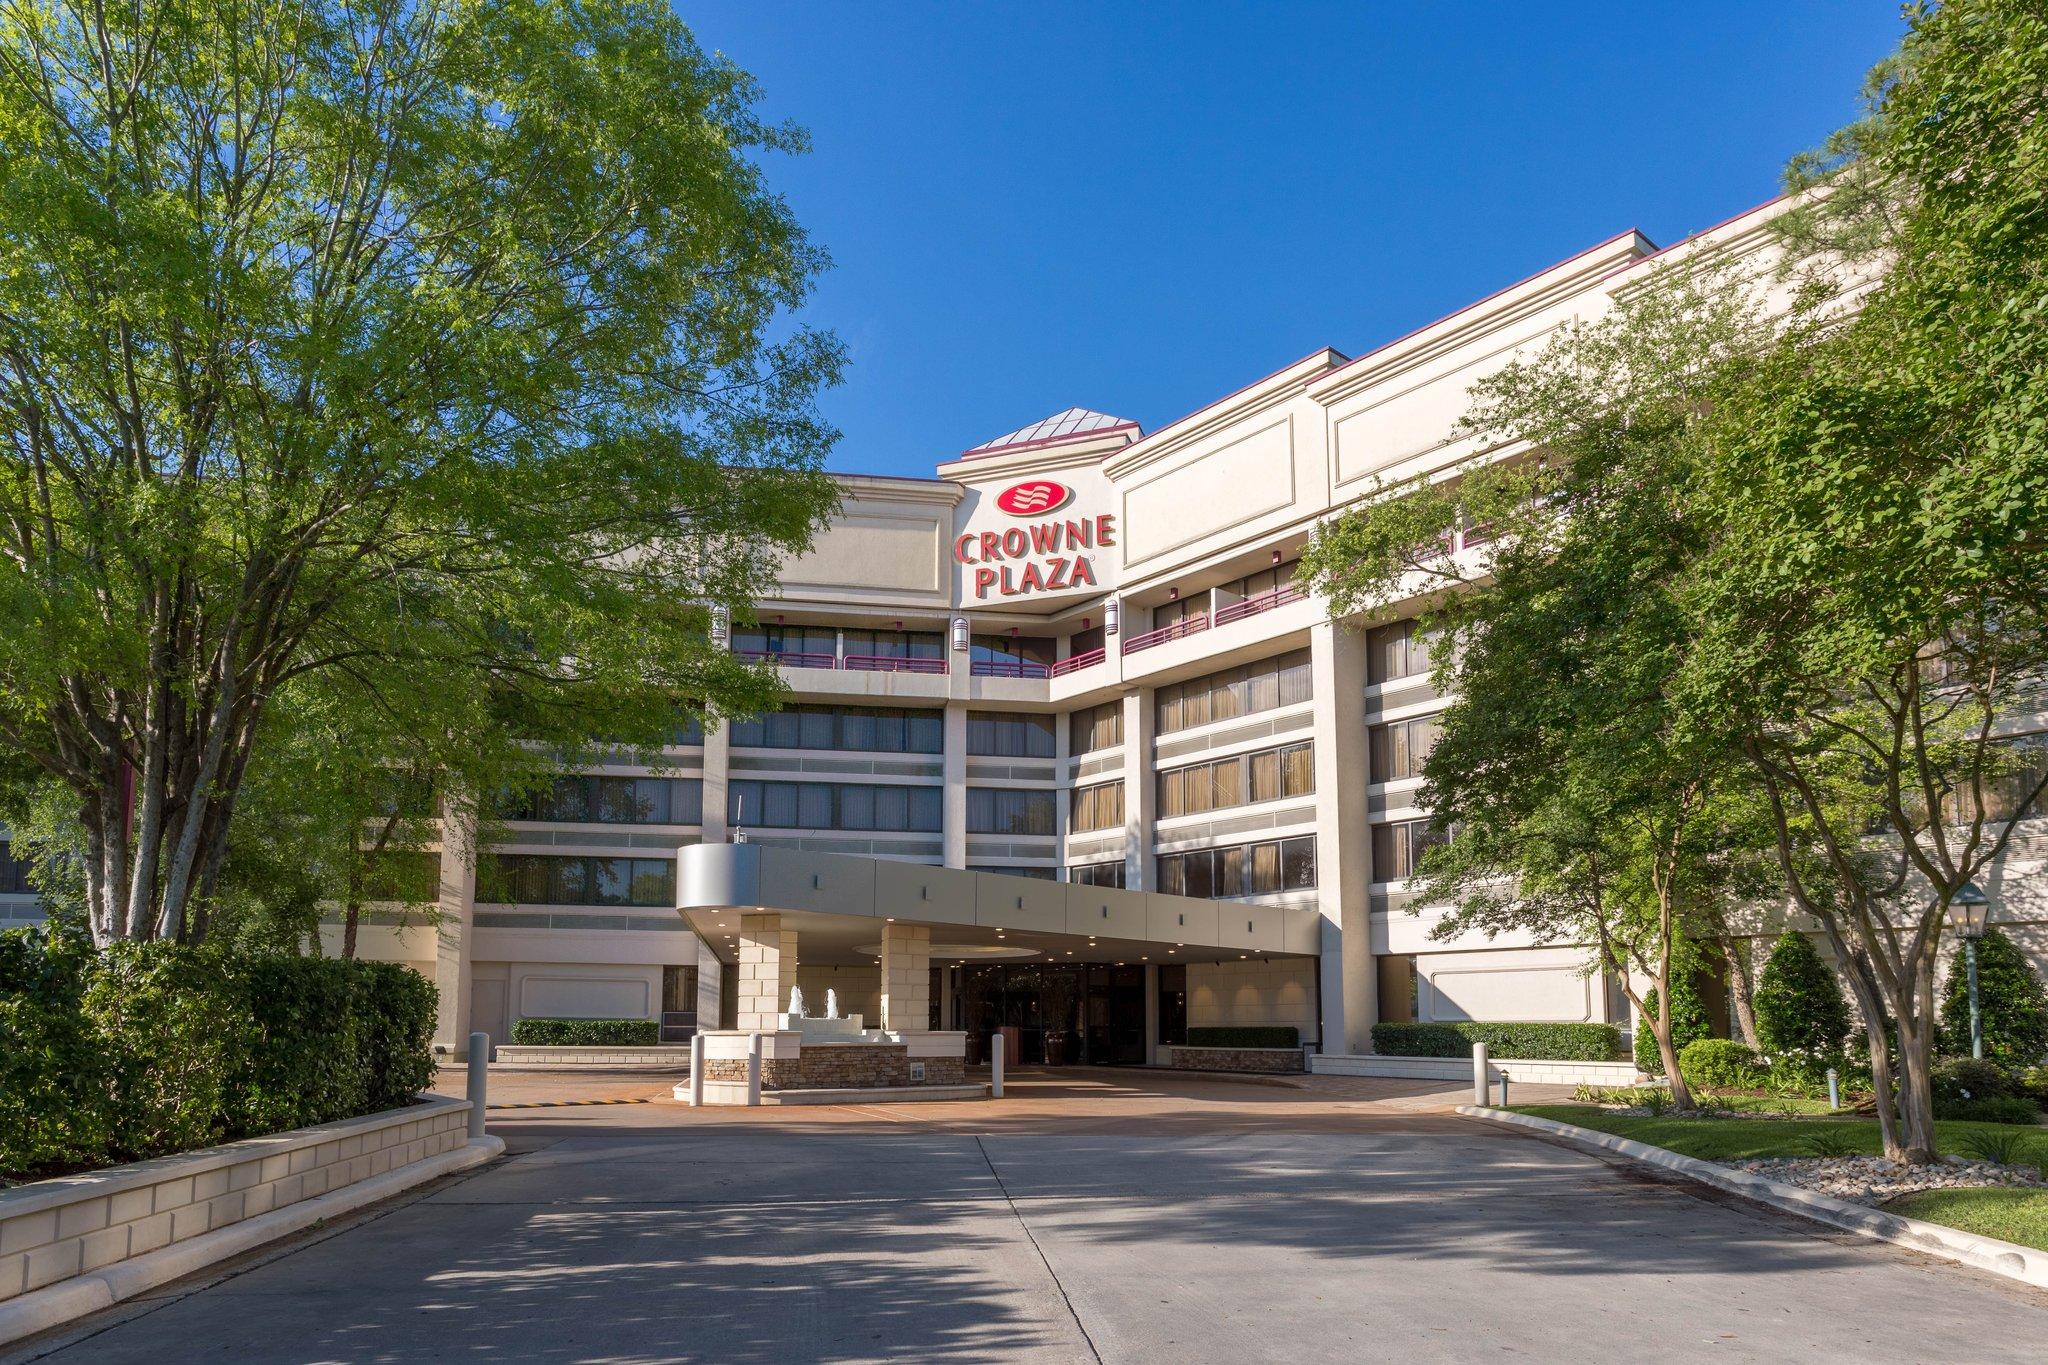 Crowne Plaza Executive Ctr Baton Rouge